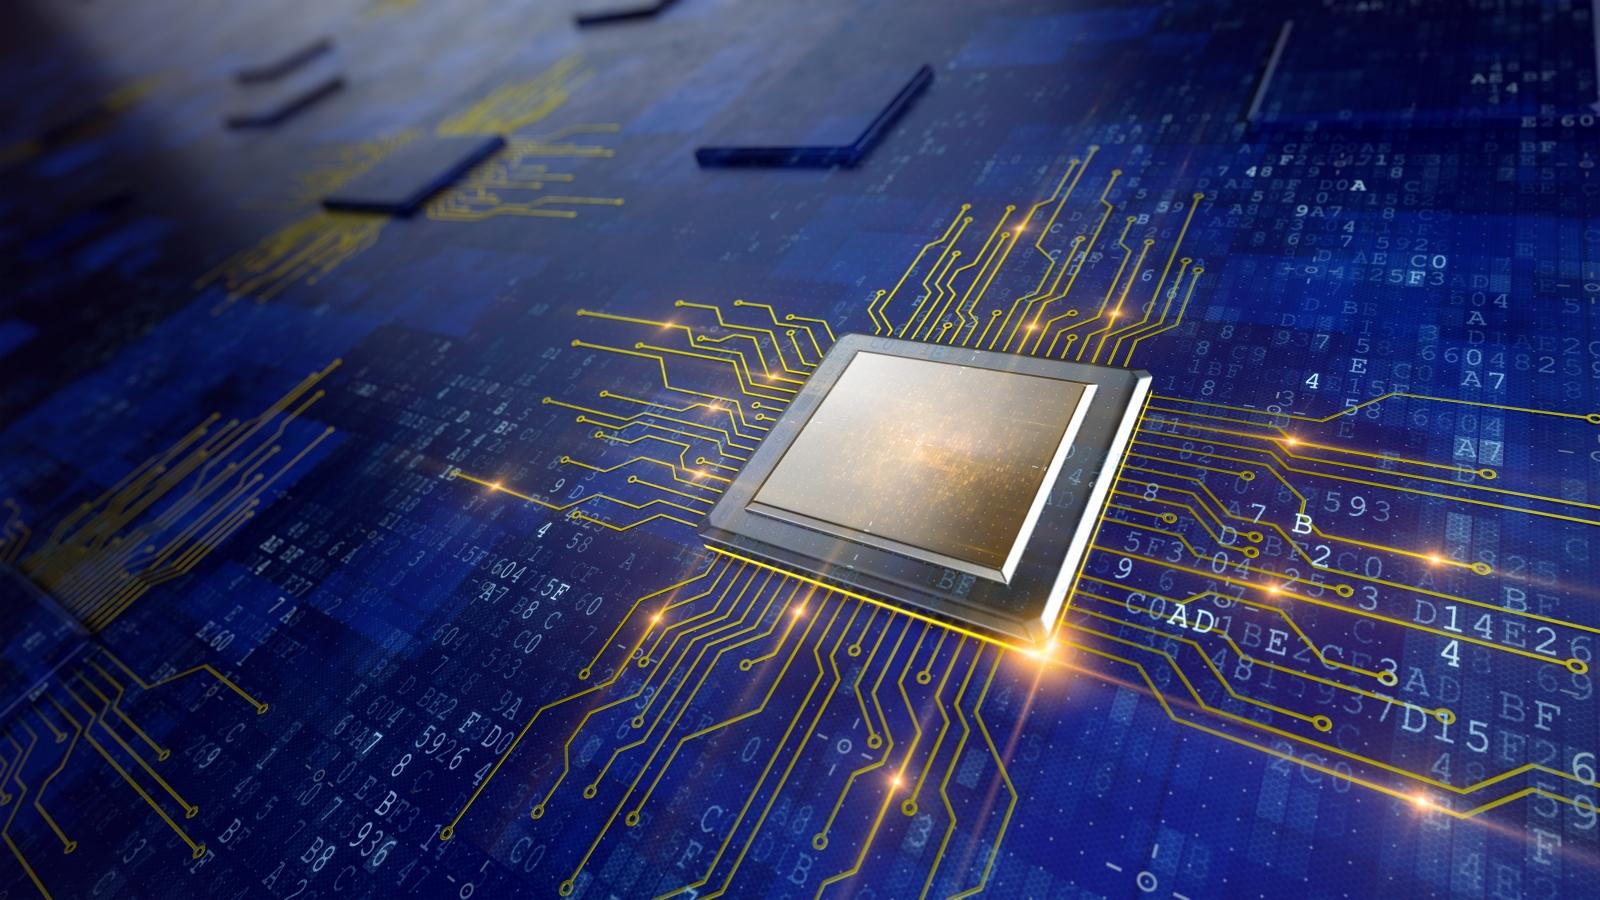 A central computer processor